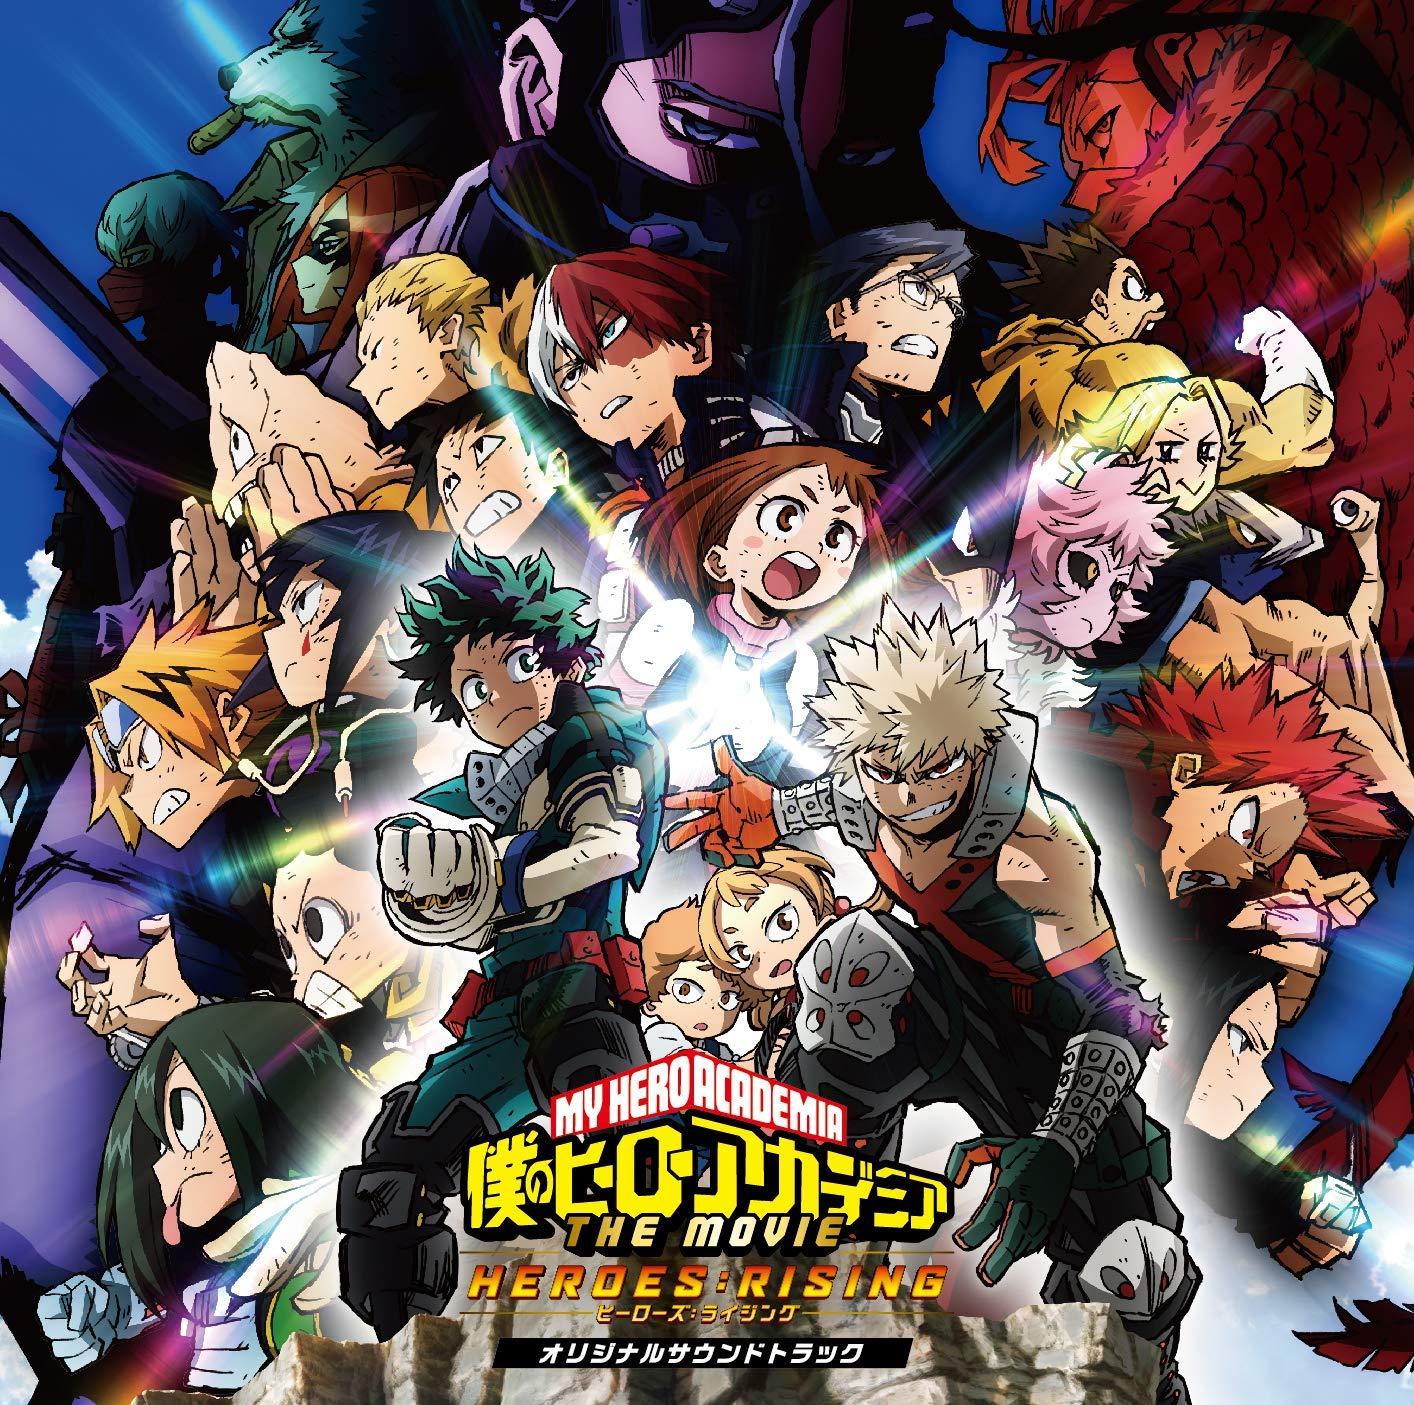 Boku no Hero Academia the Movie Heroes:Rising Original Soundtrack   僕のヒーローアカデミア THE MOVIE ヒーローズ:ライジング オリジナルサウンドトラック